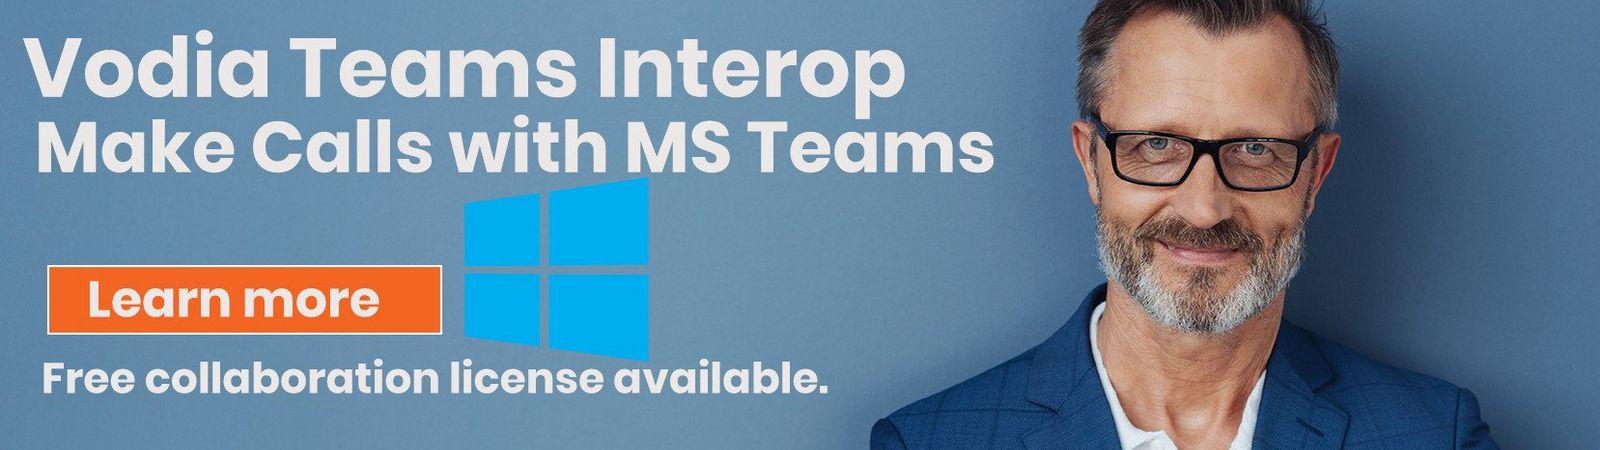 csm-interop1980-7344b7b552.jpg